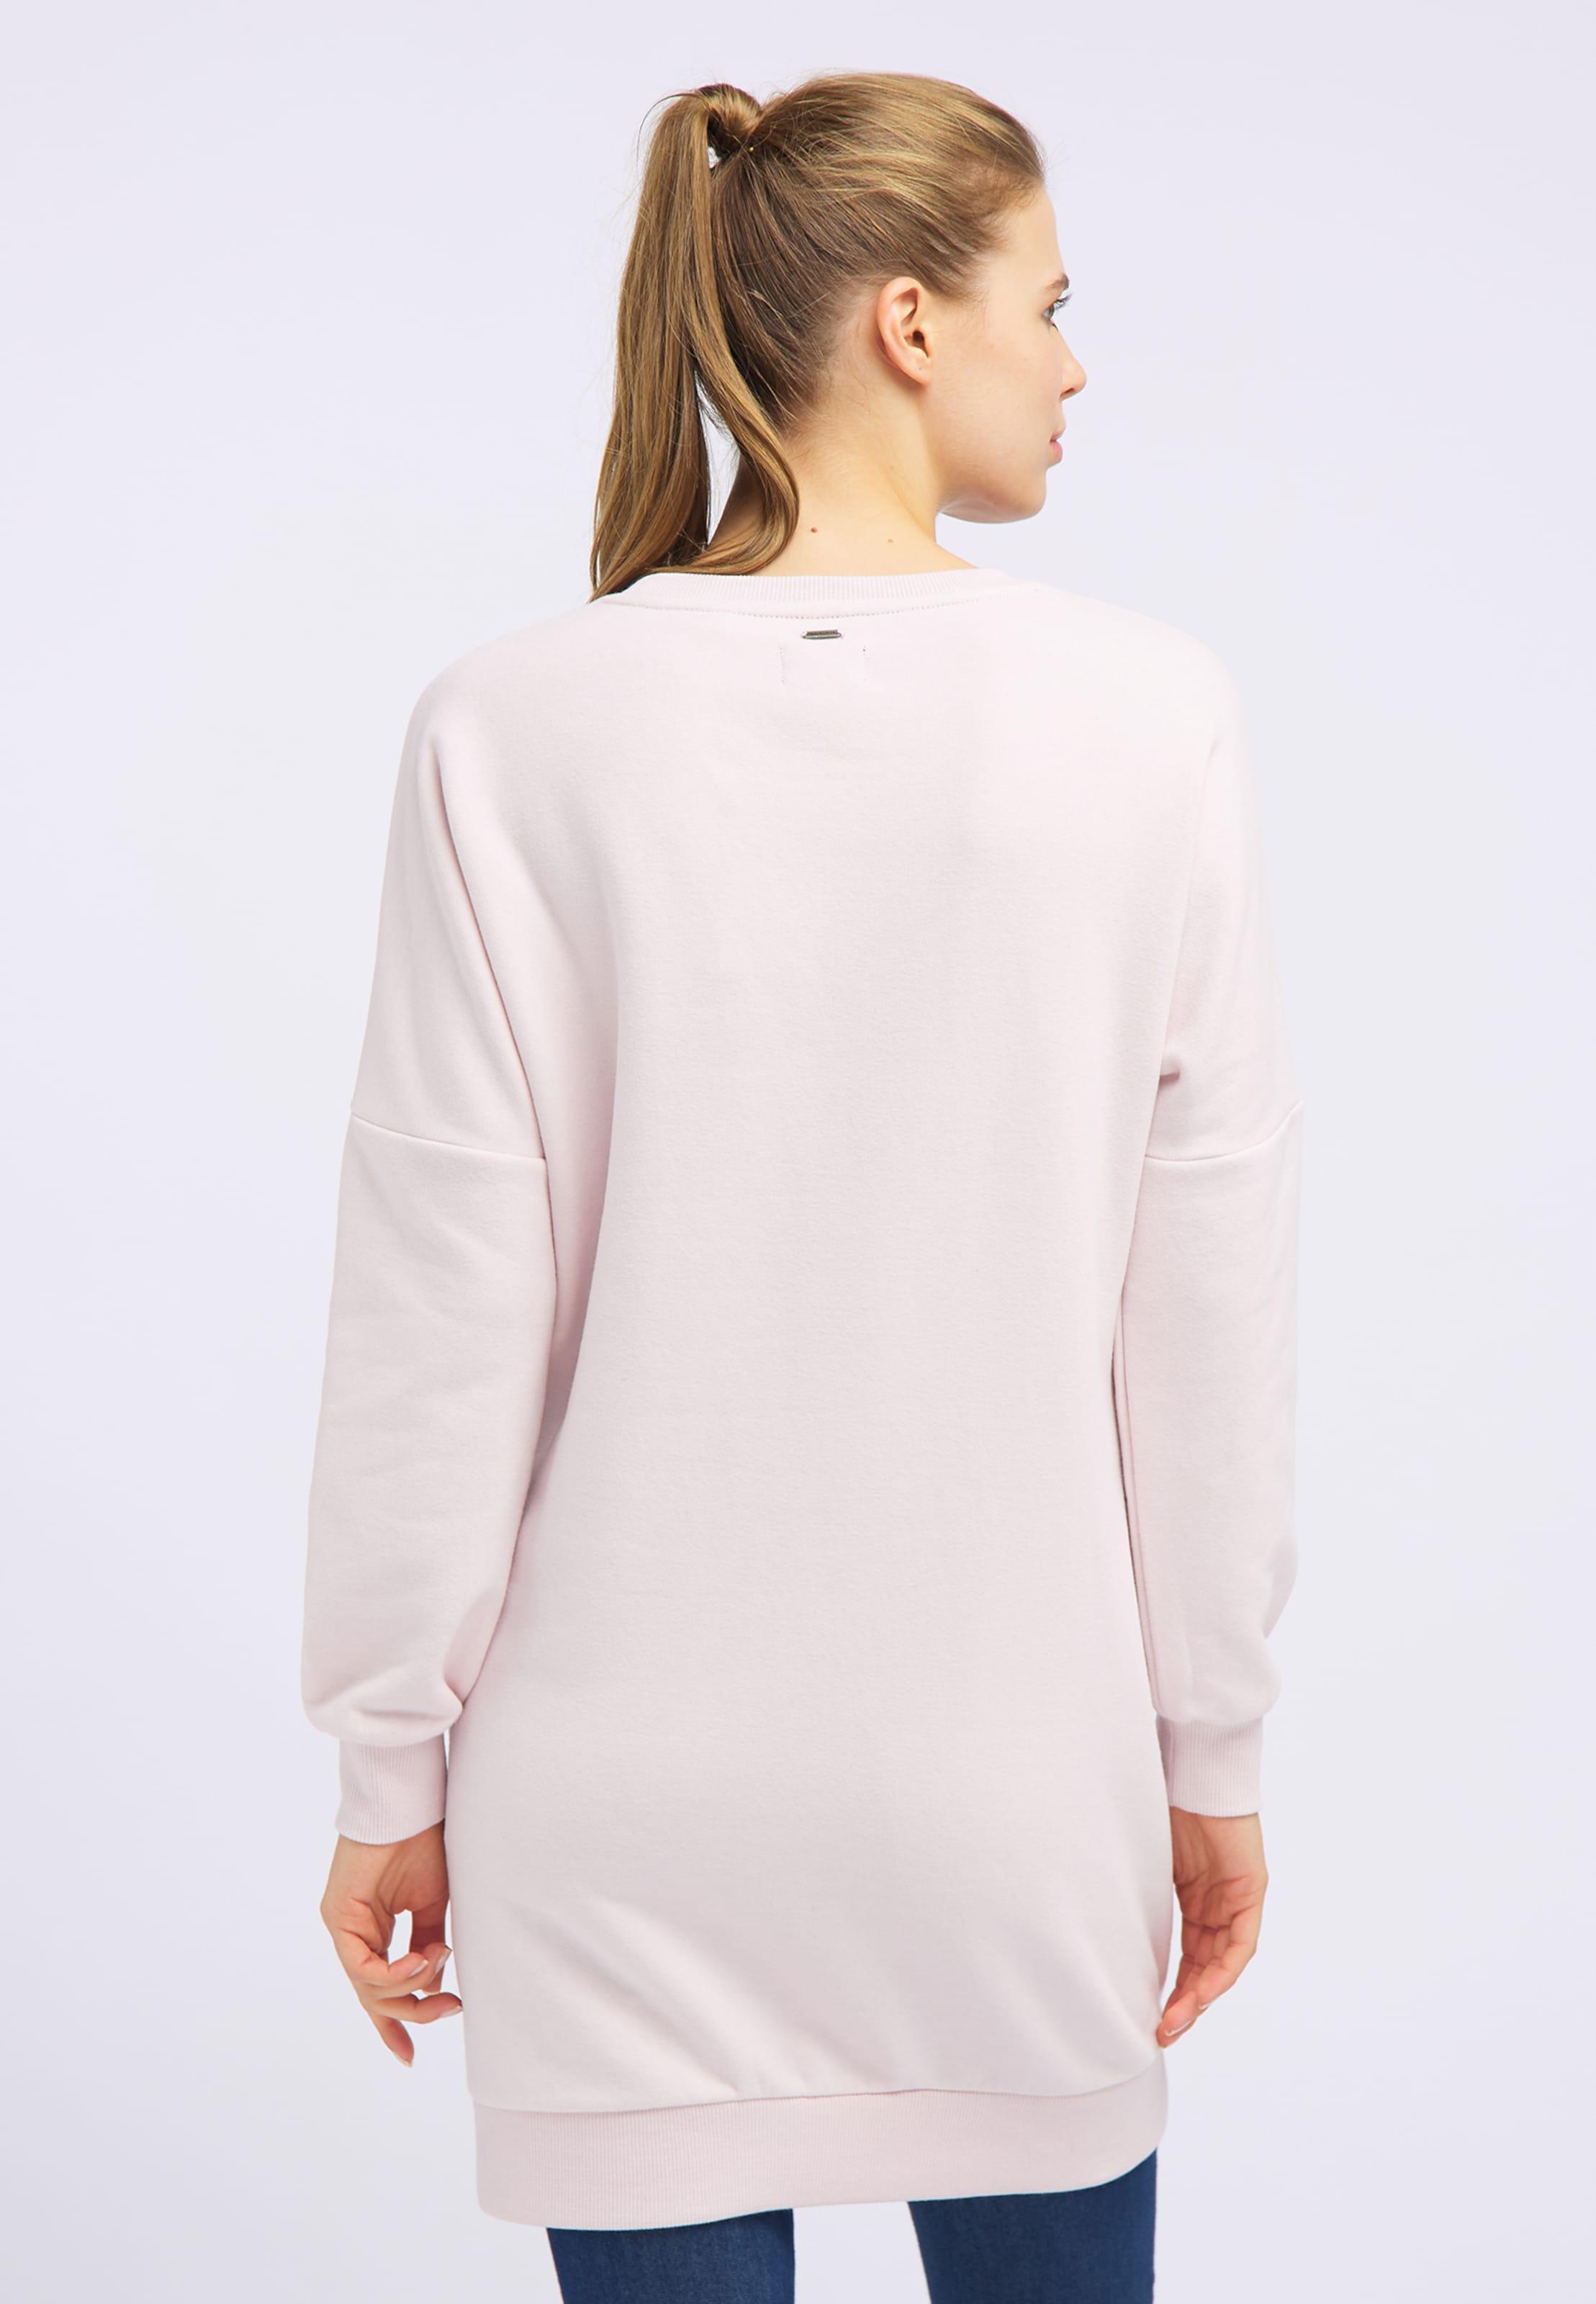 Rosa In Rosa Dreimaster In Dreimaster Sweatshirtkleid Sweatshirtkleid FK1clJ